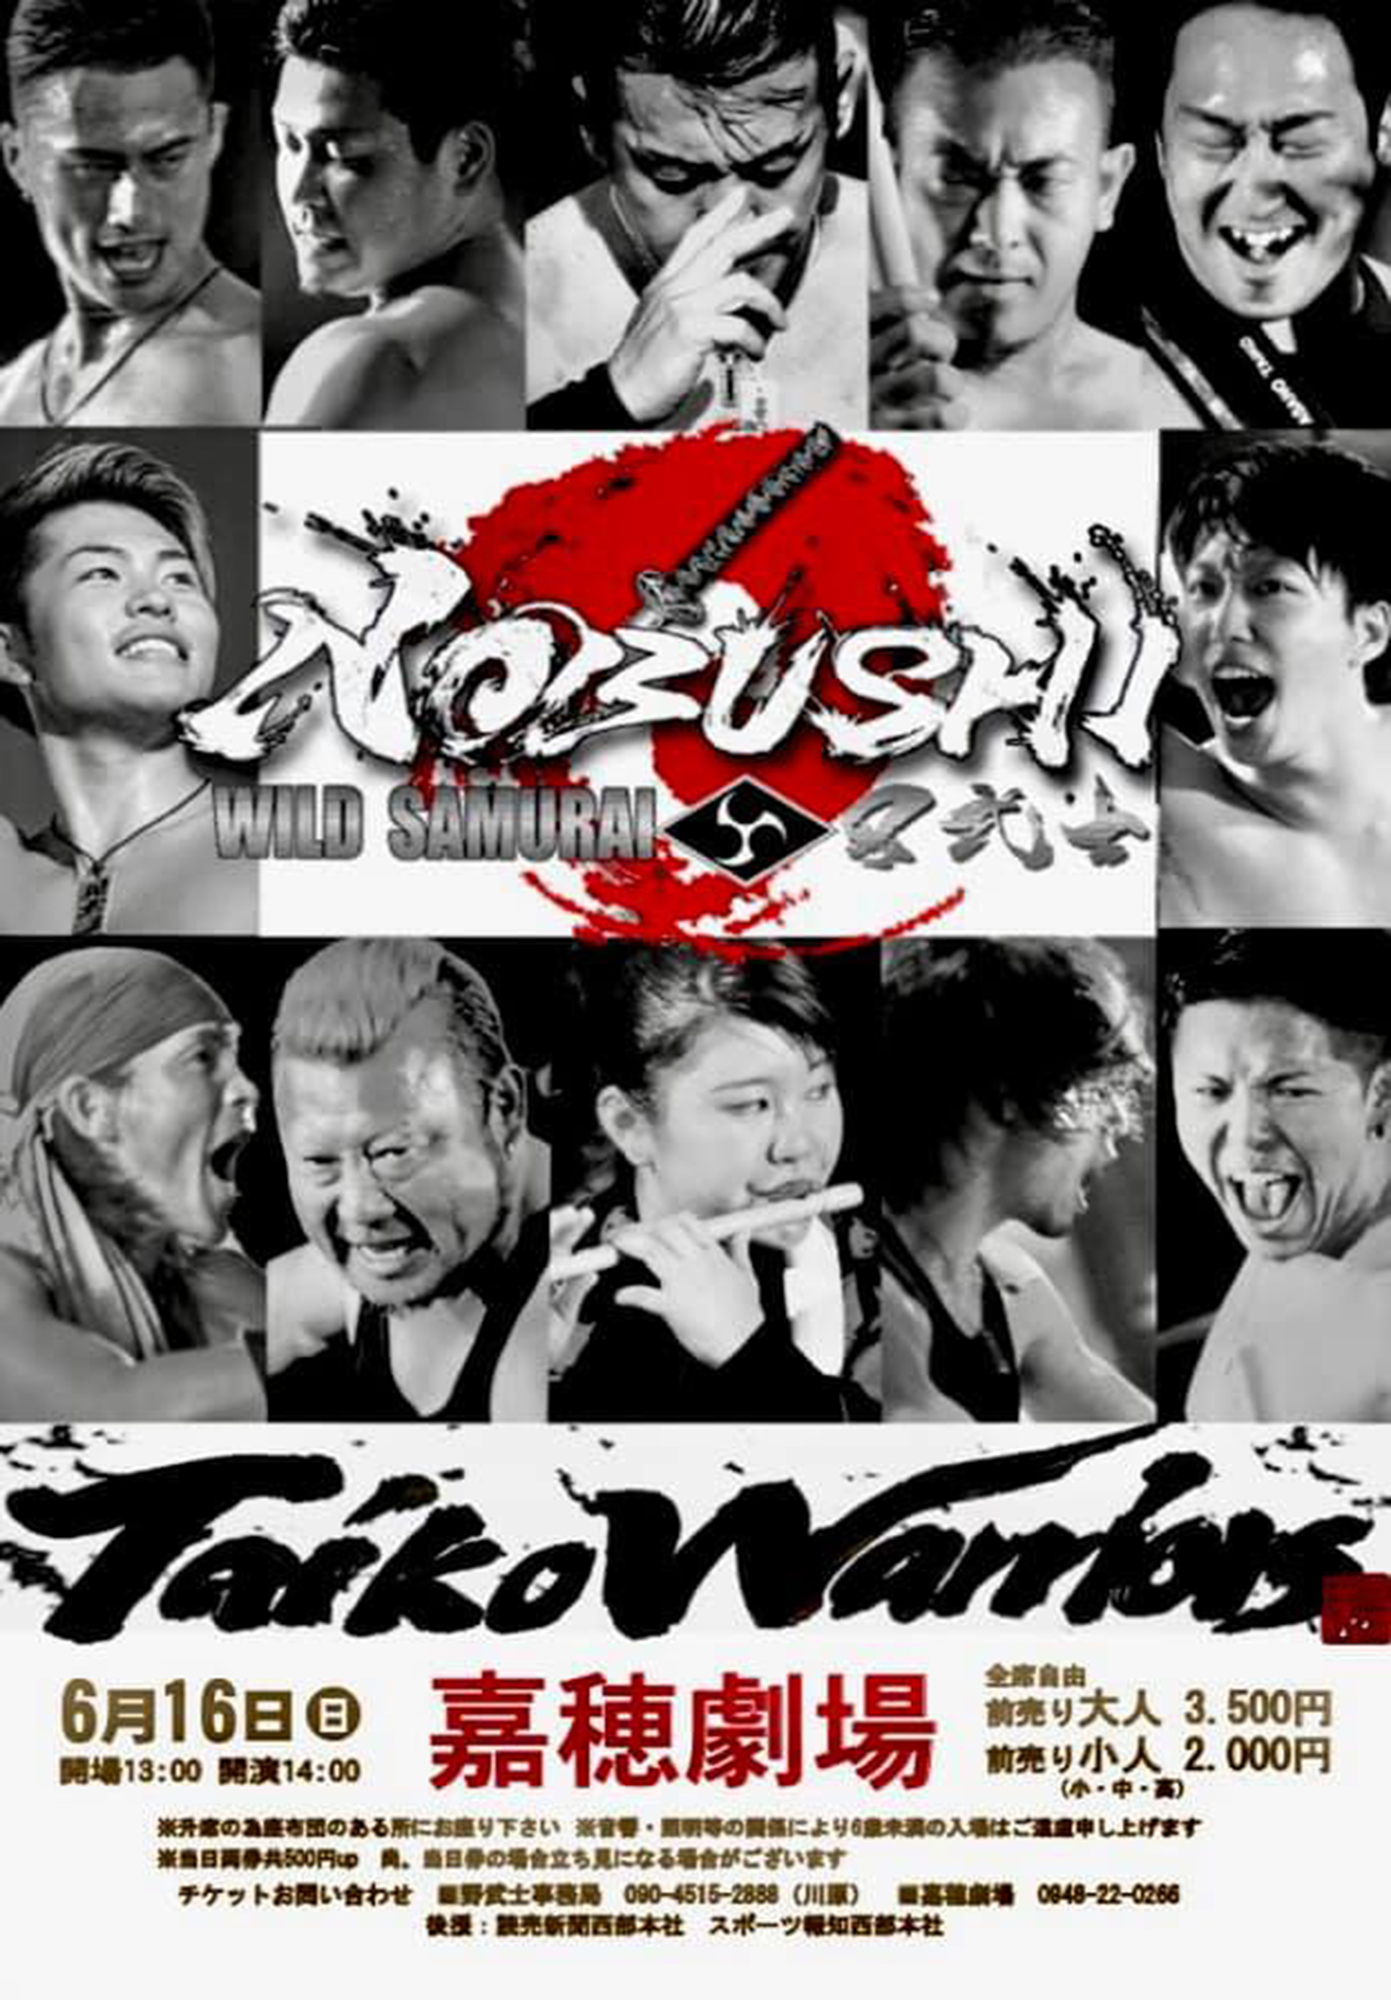 190616_nobushi_taiko_warriors